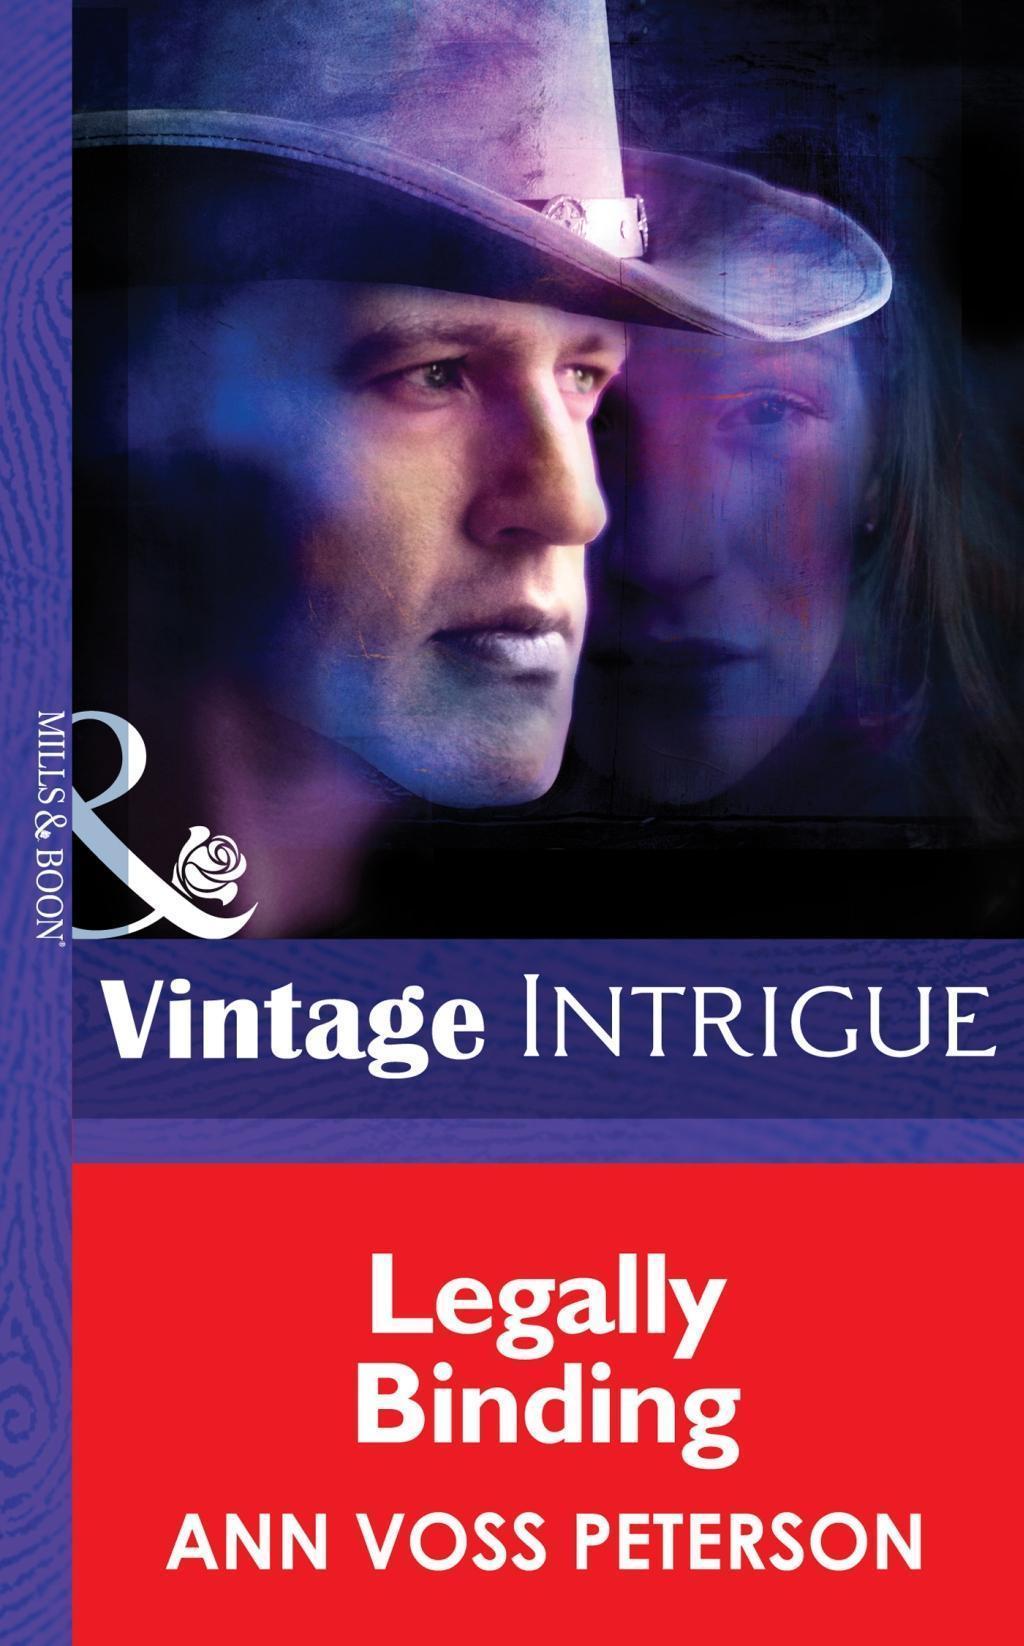 Legally Binding (Mills & Boon Intrigue) (Shotgun Sallys, Book 2)